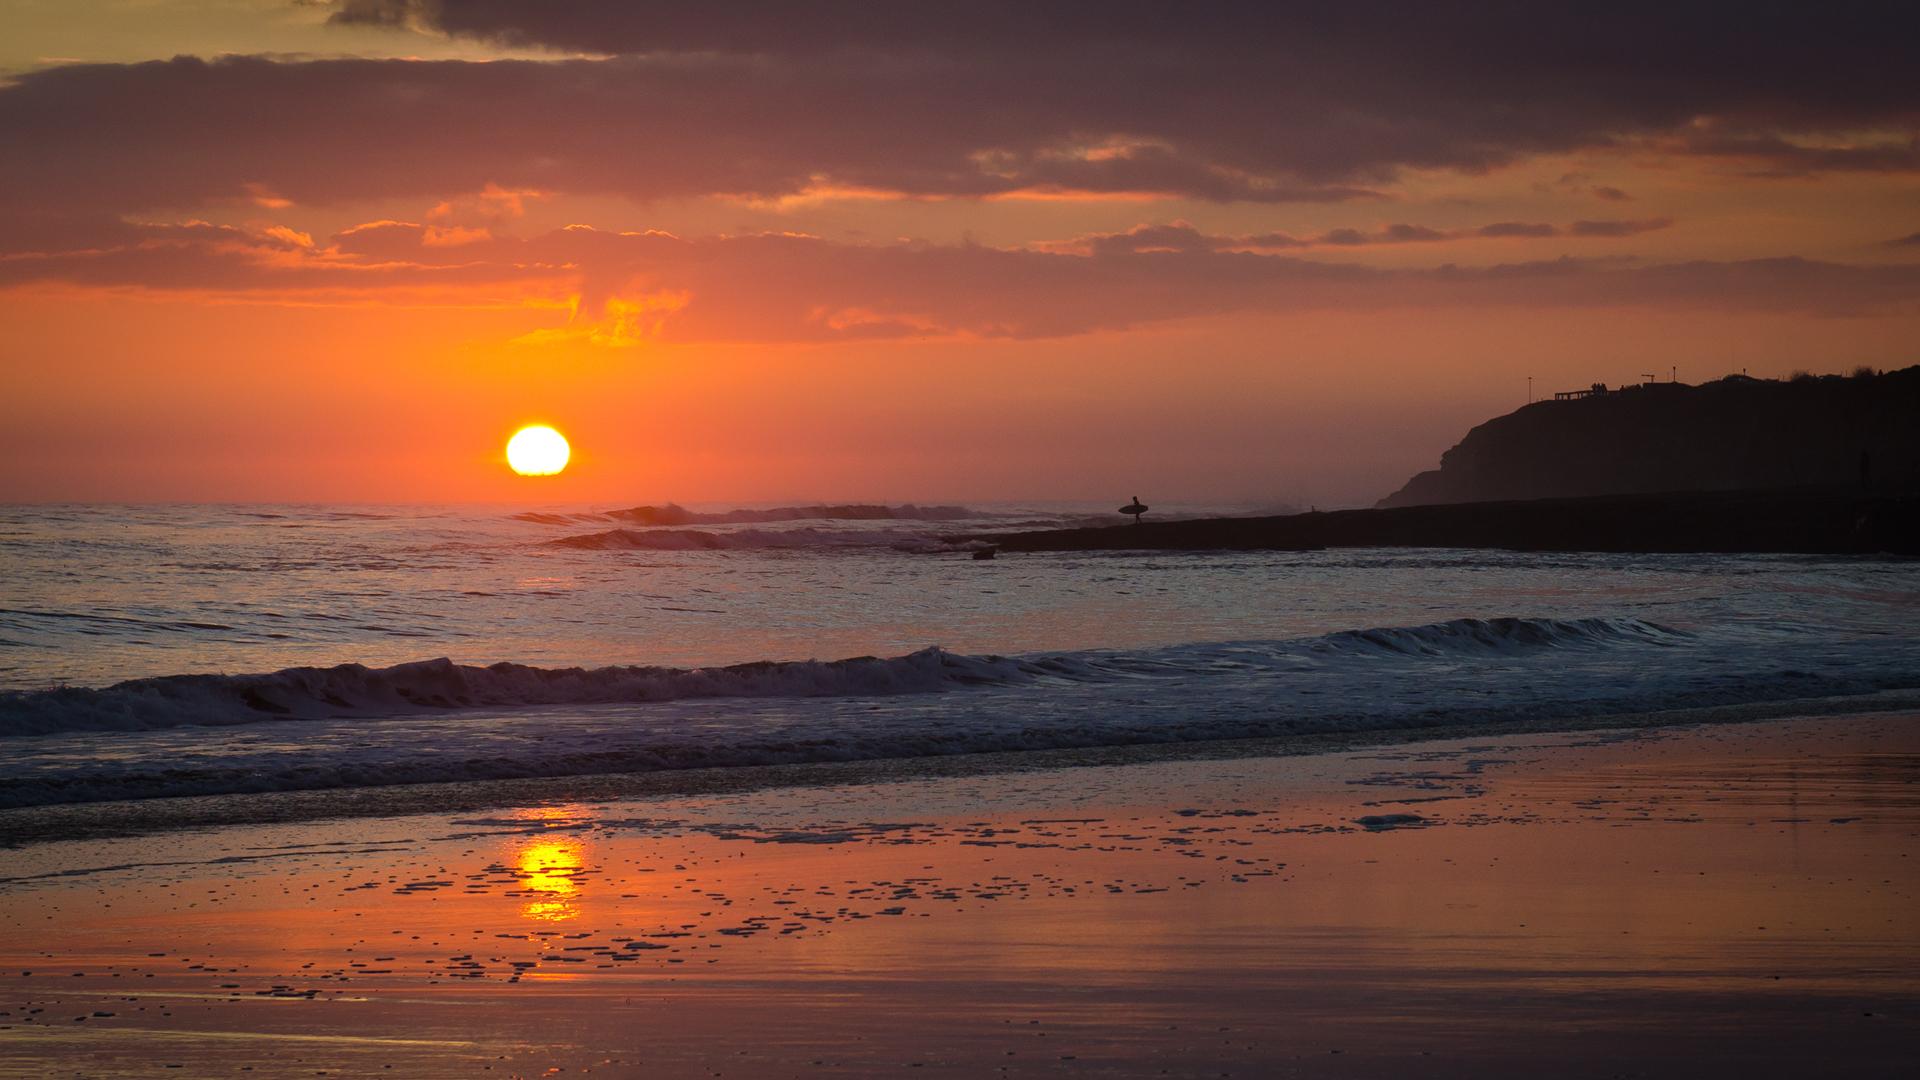 sunset hd wallpaper   background image   1920x1080   id:351417